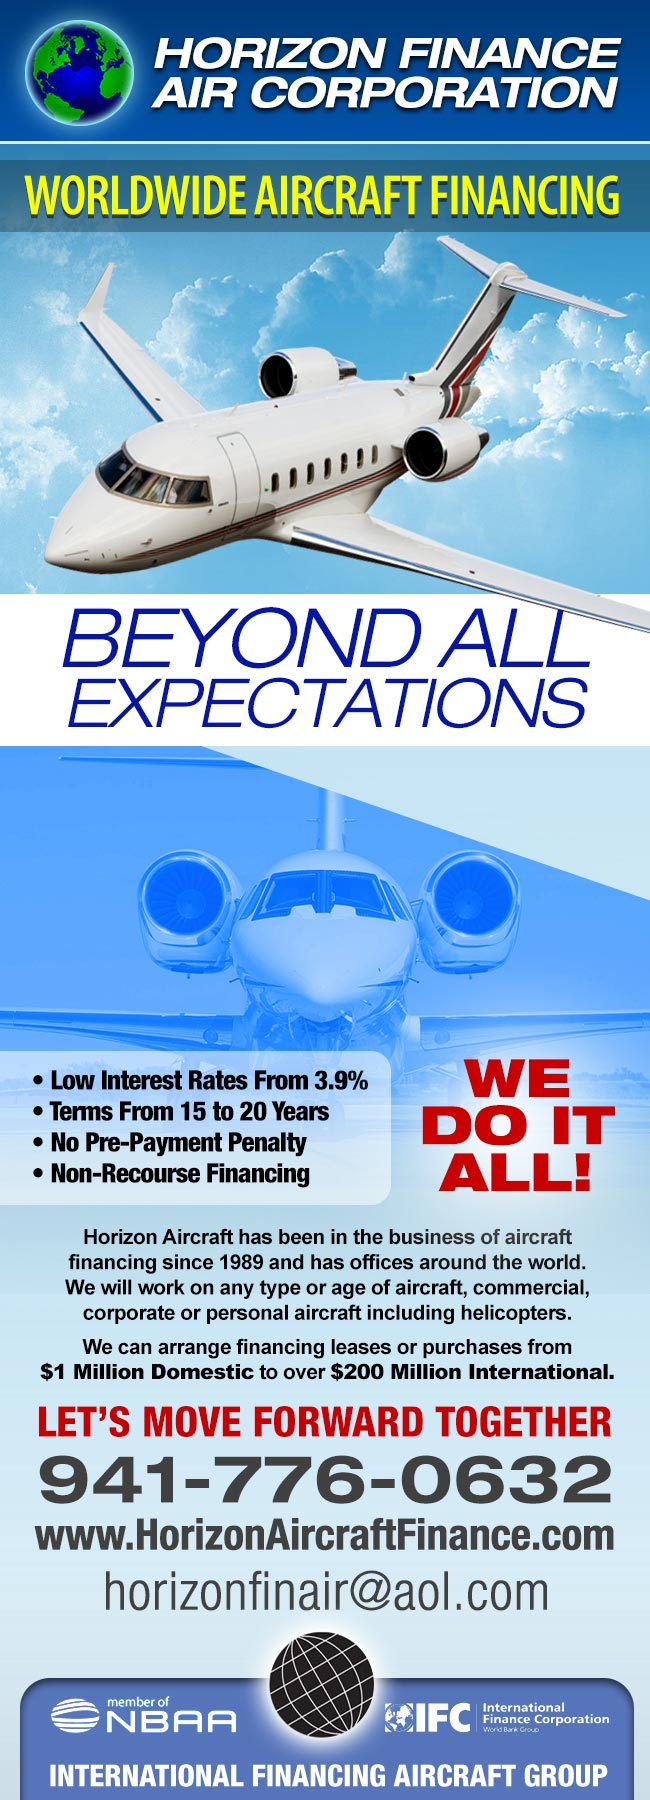 Horizon Finance Air Corporation | Worldwide Aircraft Financing